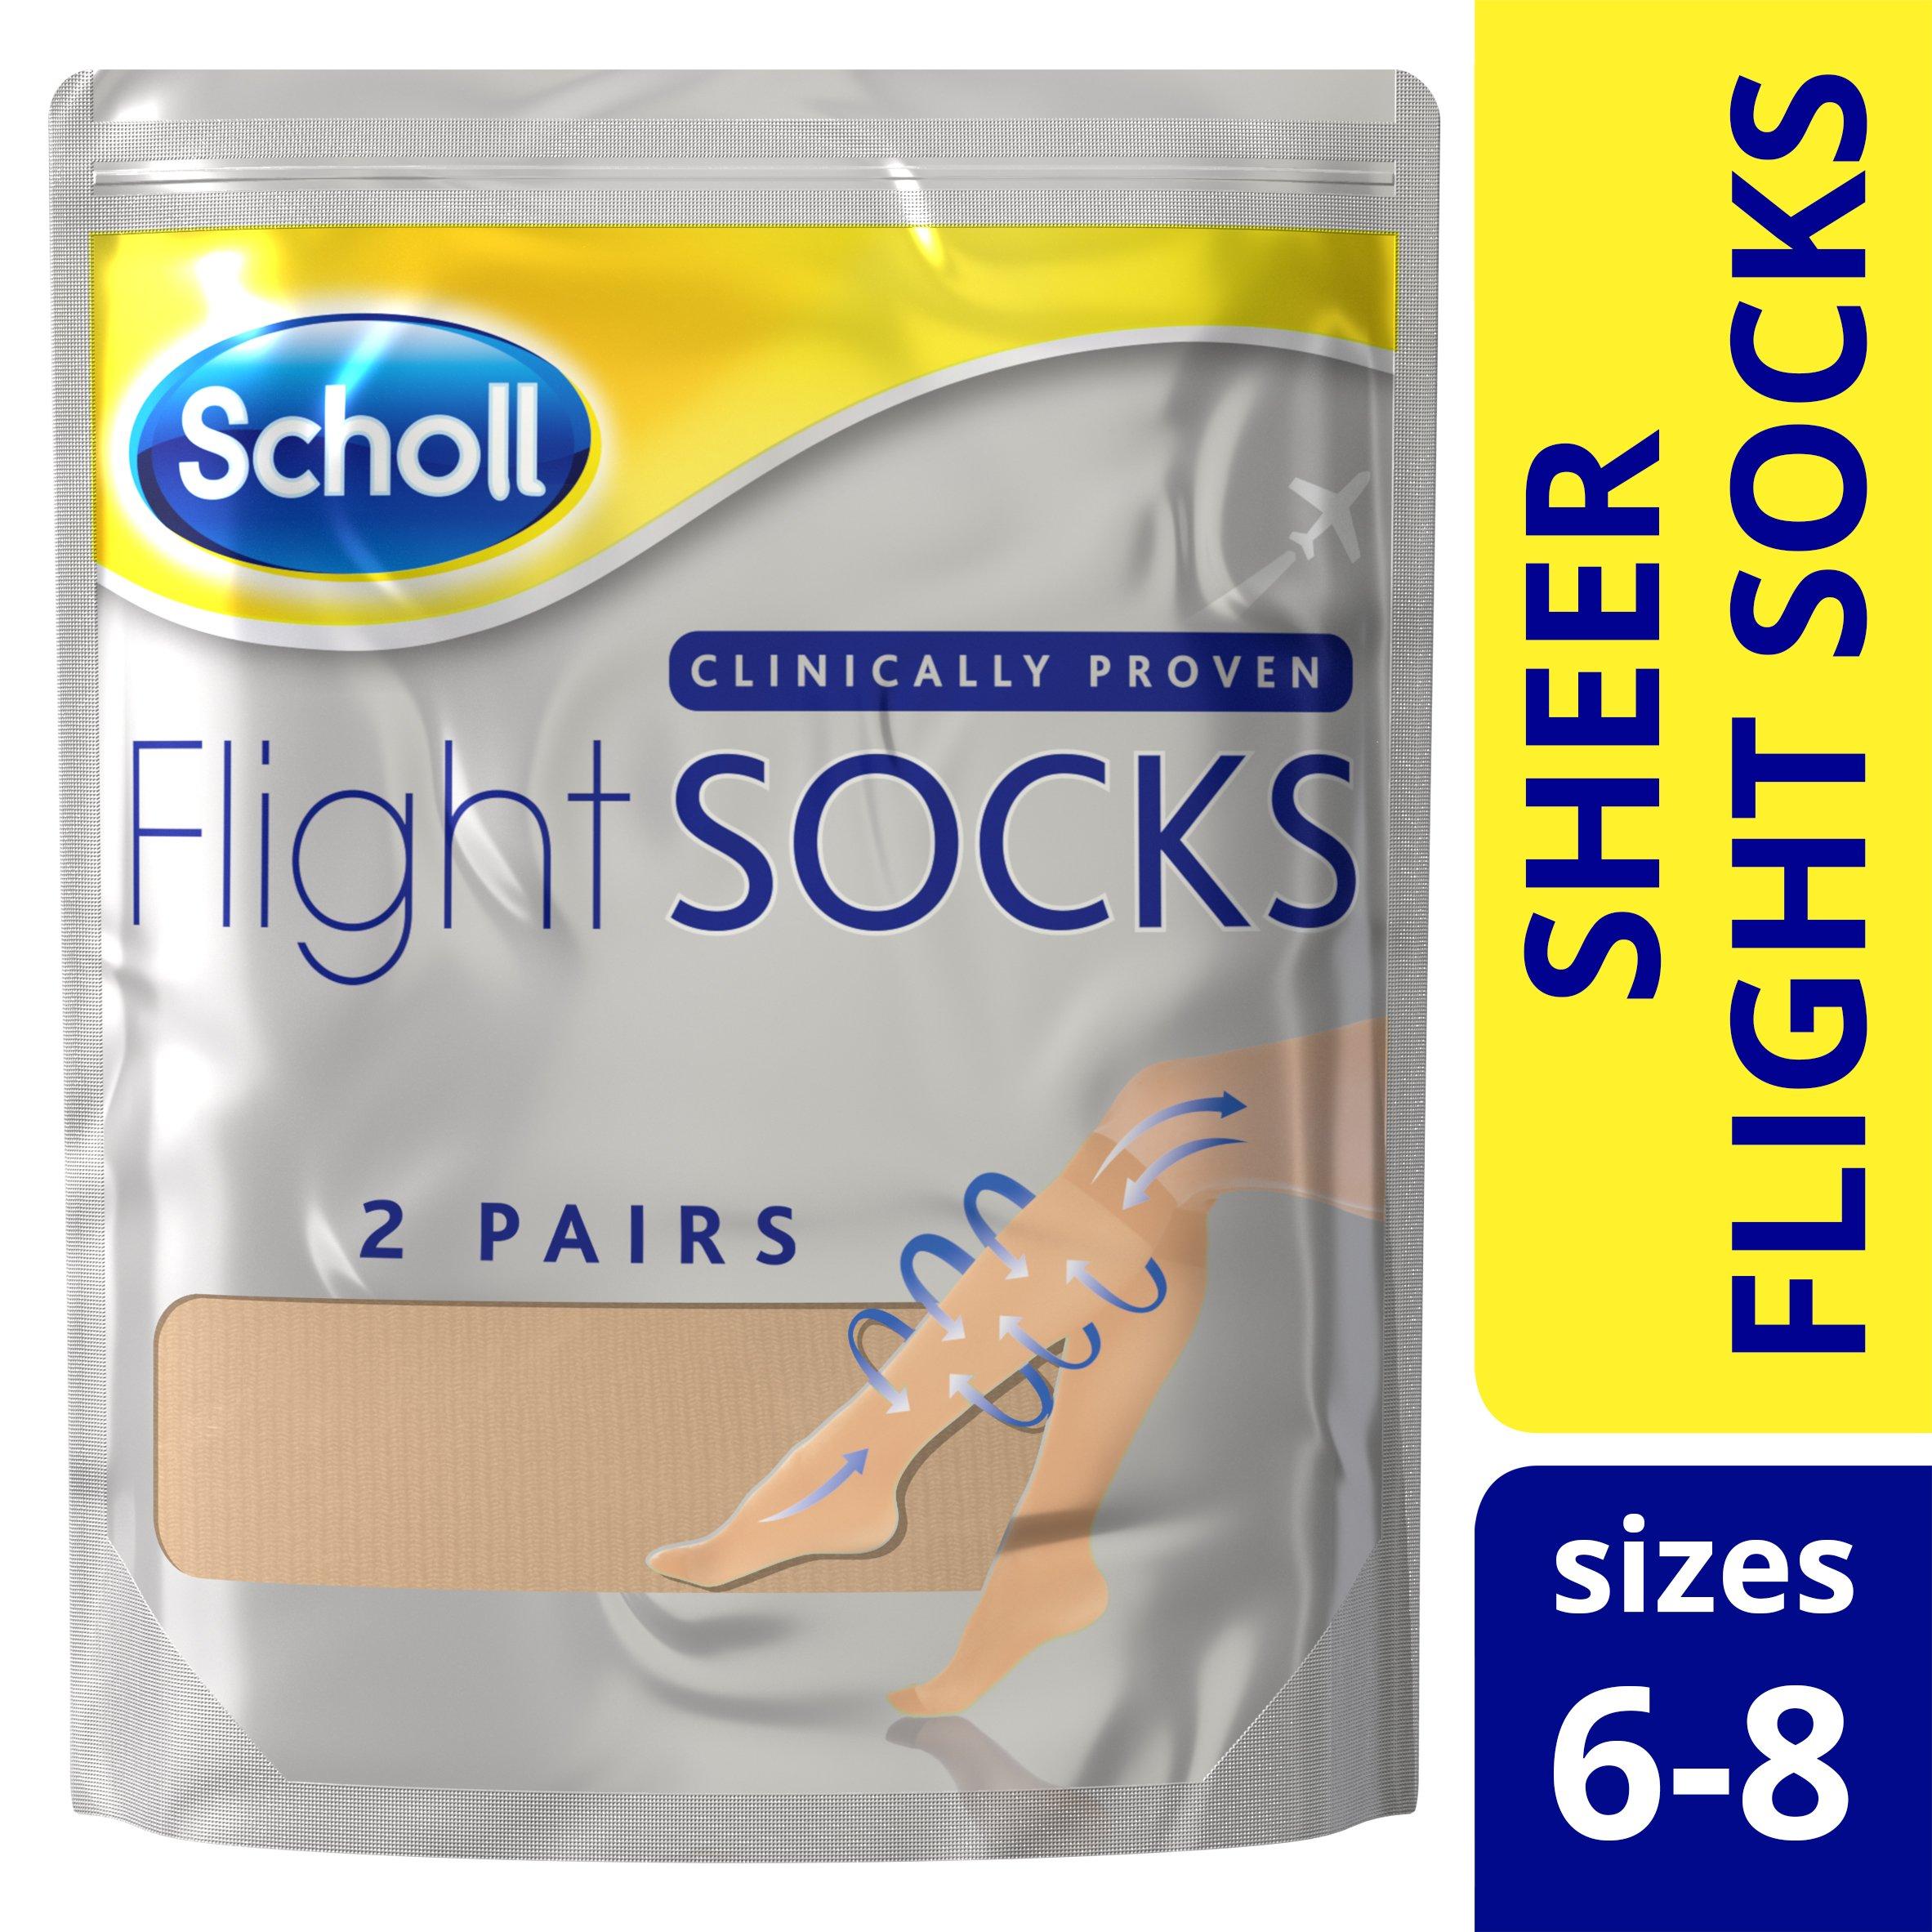 Travel Socks 4-7 uk Black Sockshop 2 Pairs 40 Denier Compression DVT Flight